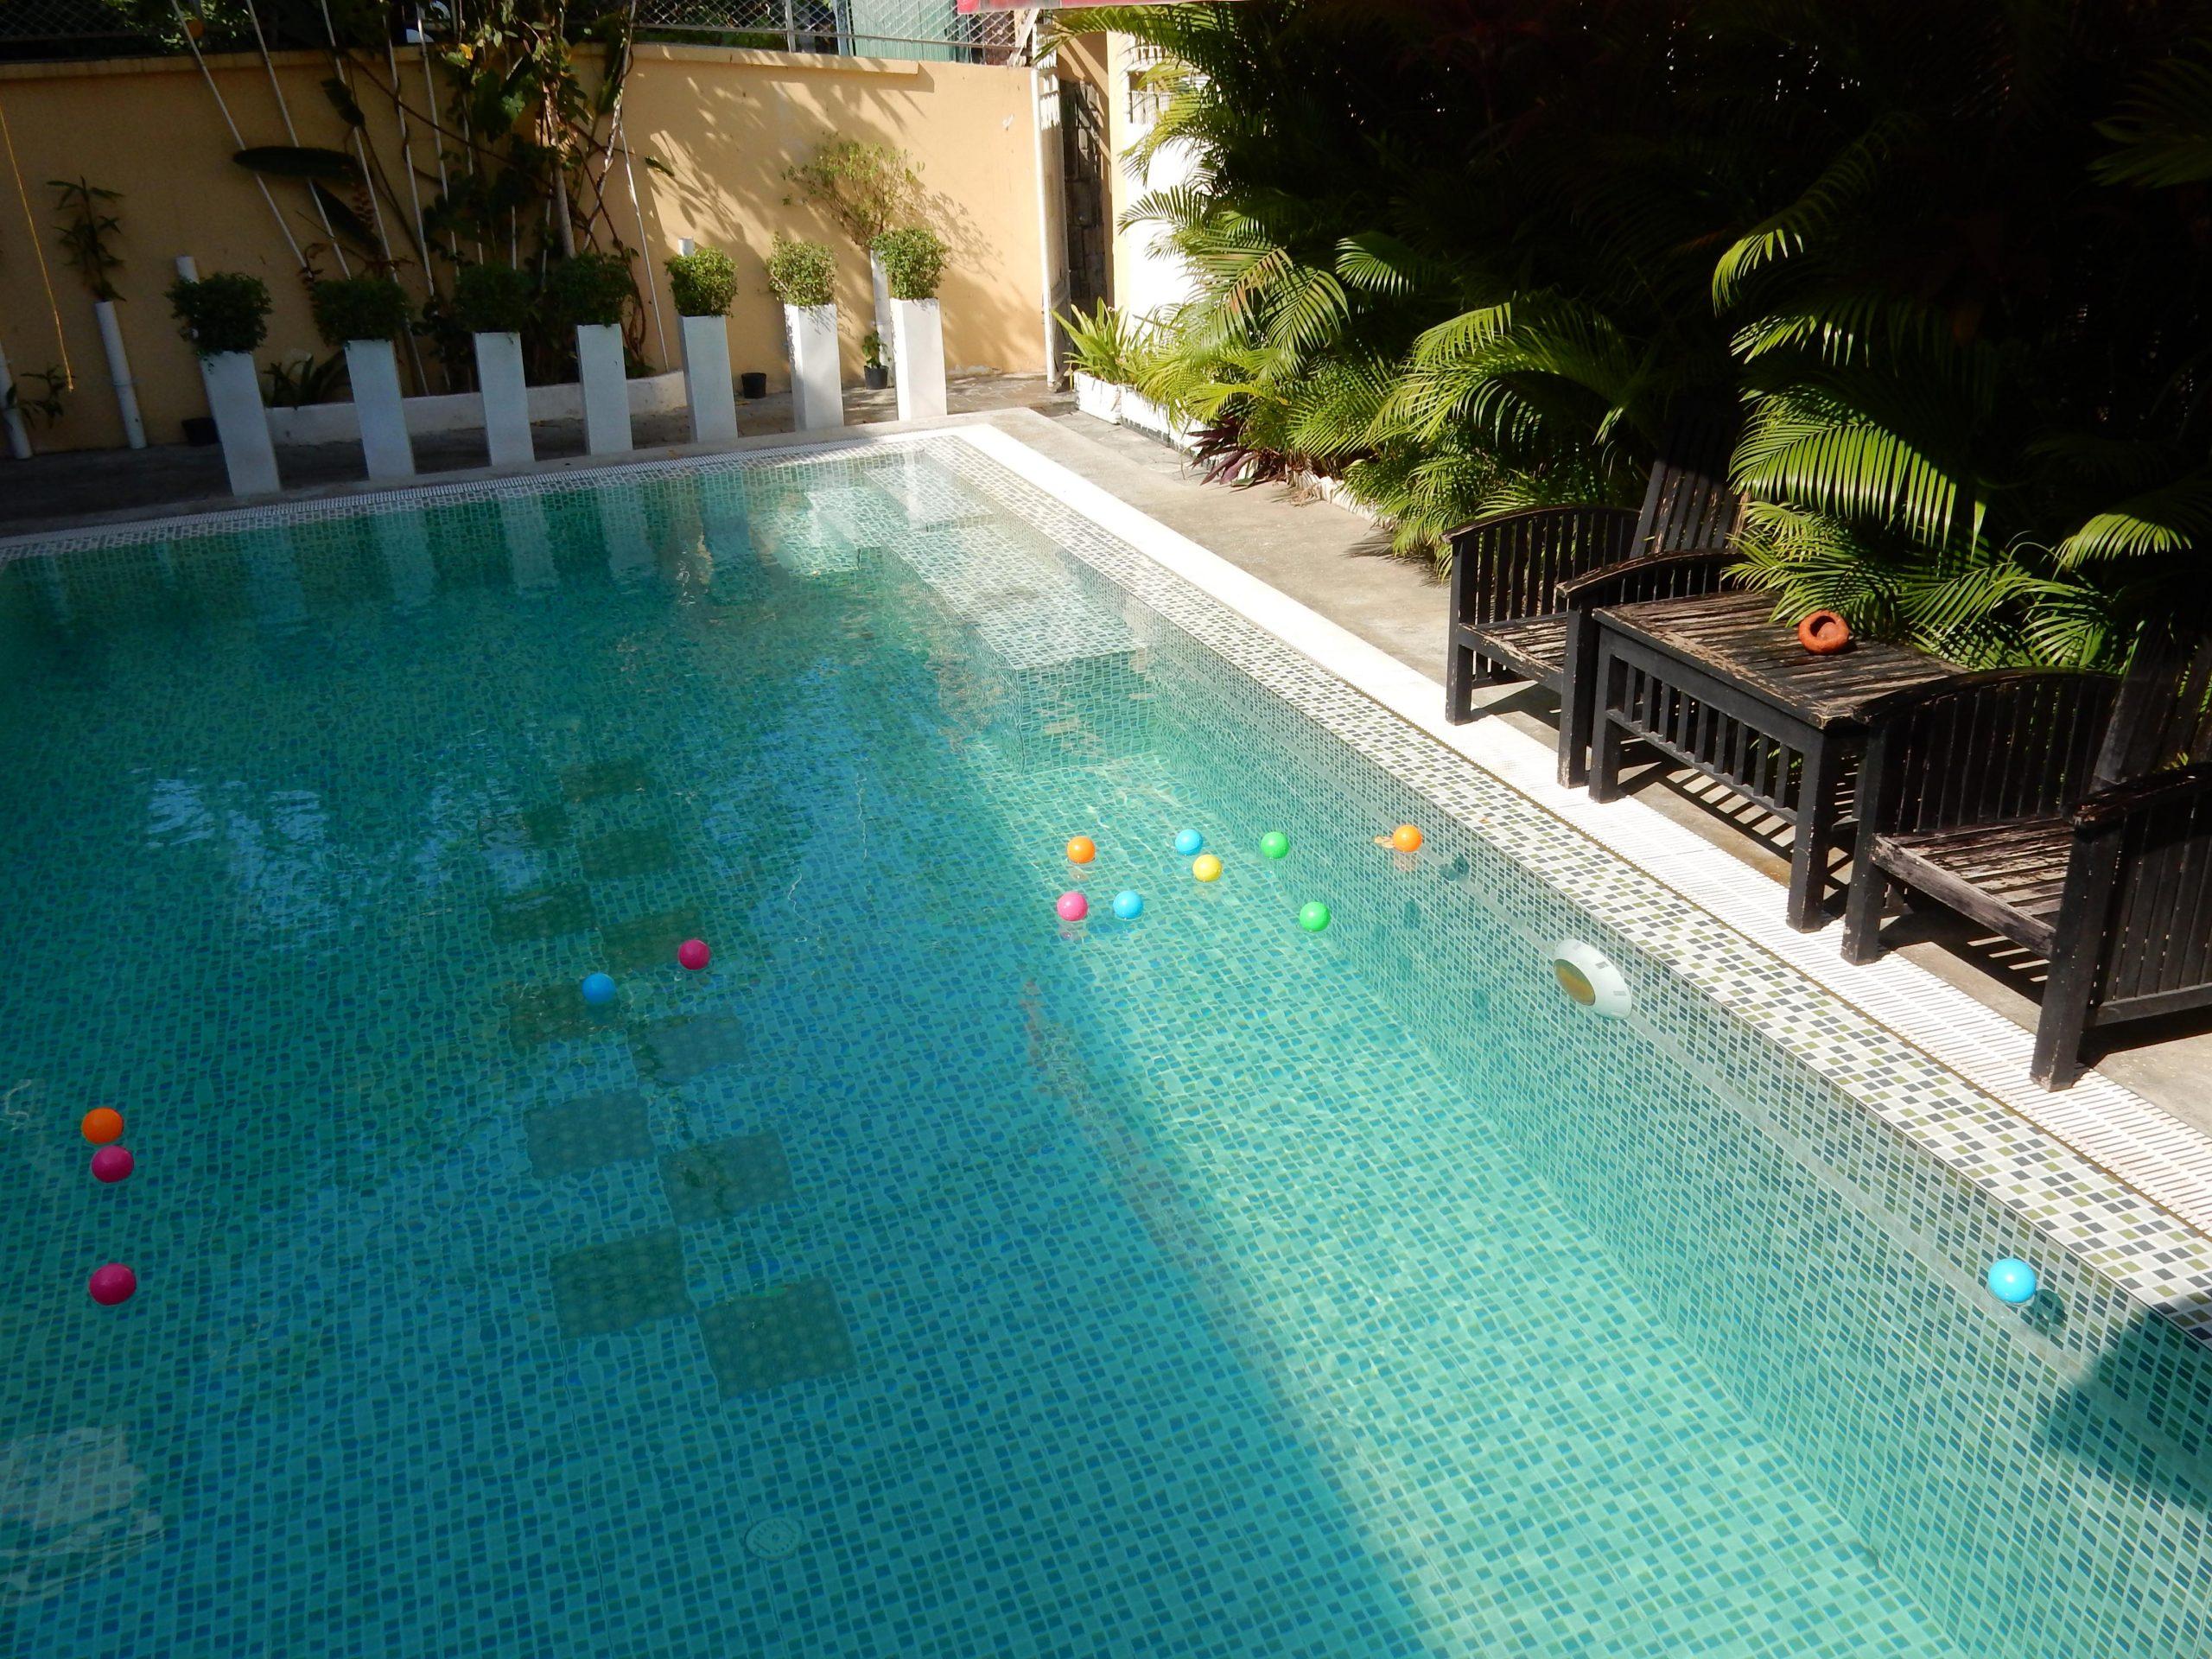 Royal Mekong Boutique Hotel pool